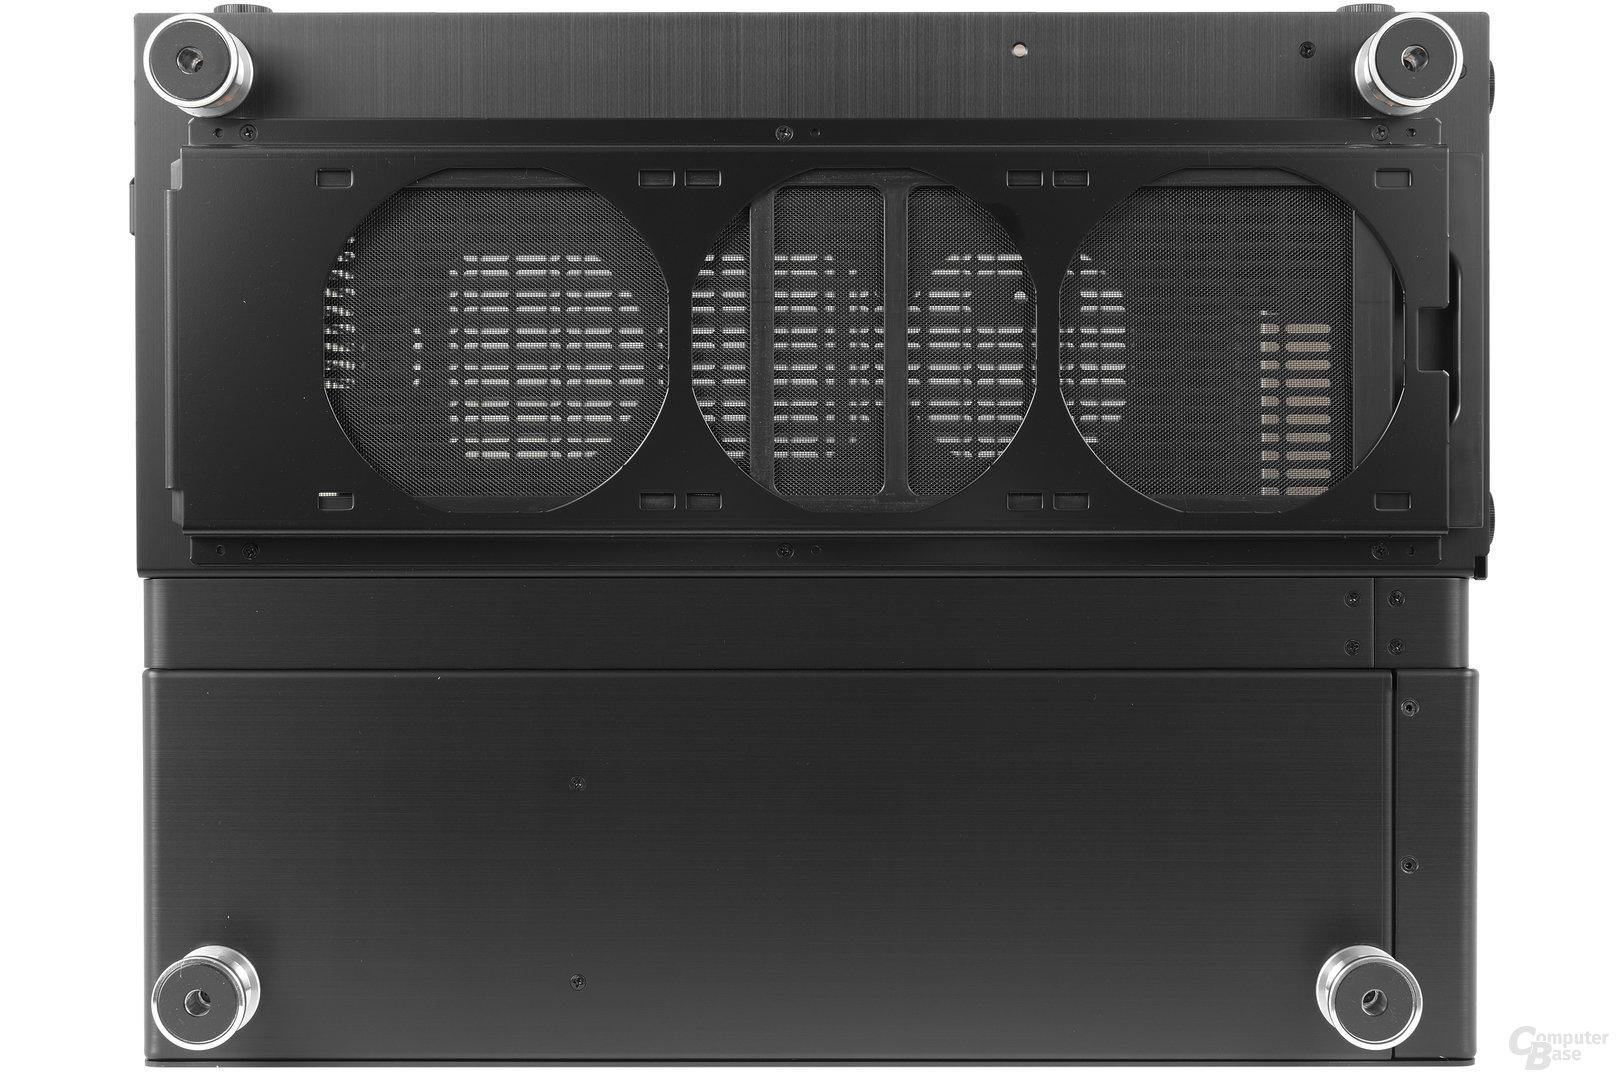 Lian Li PC-O9 – Untersicht